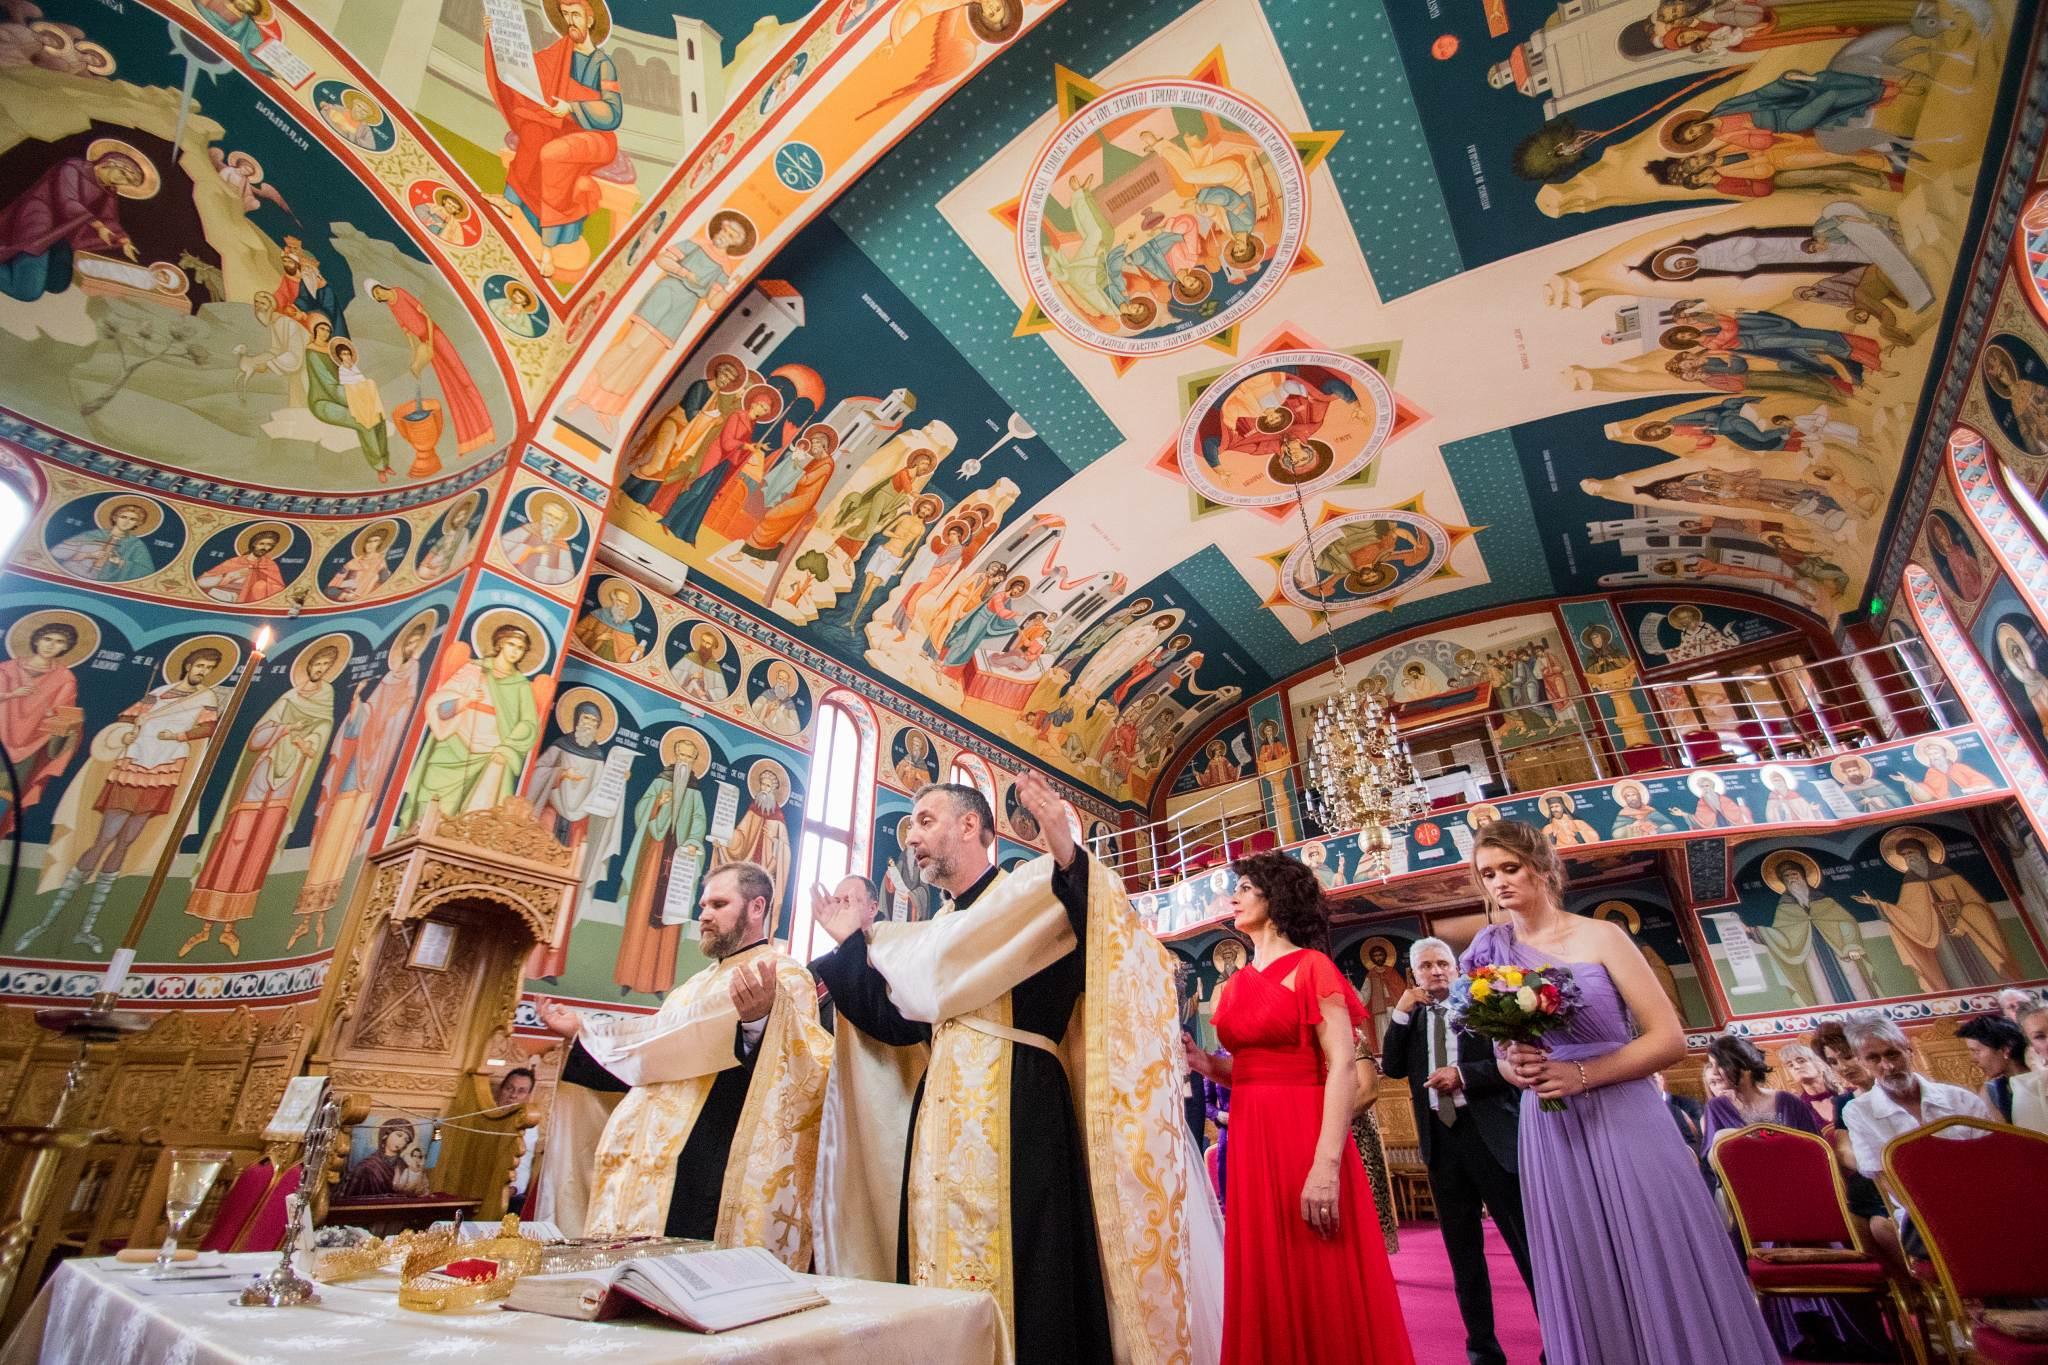 fotografii-nunta-cristina-si-sorin48.jpg